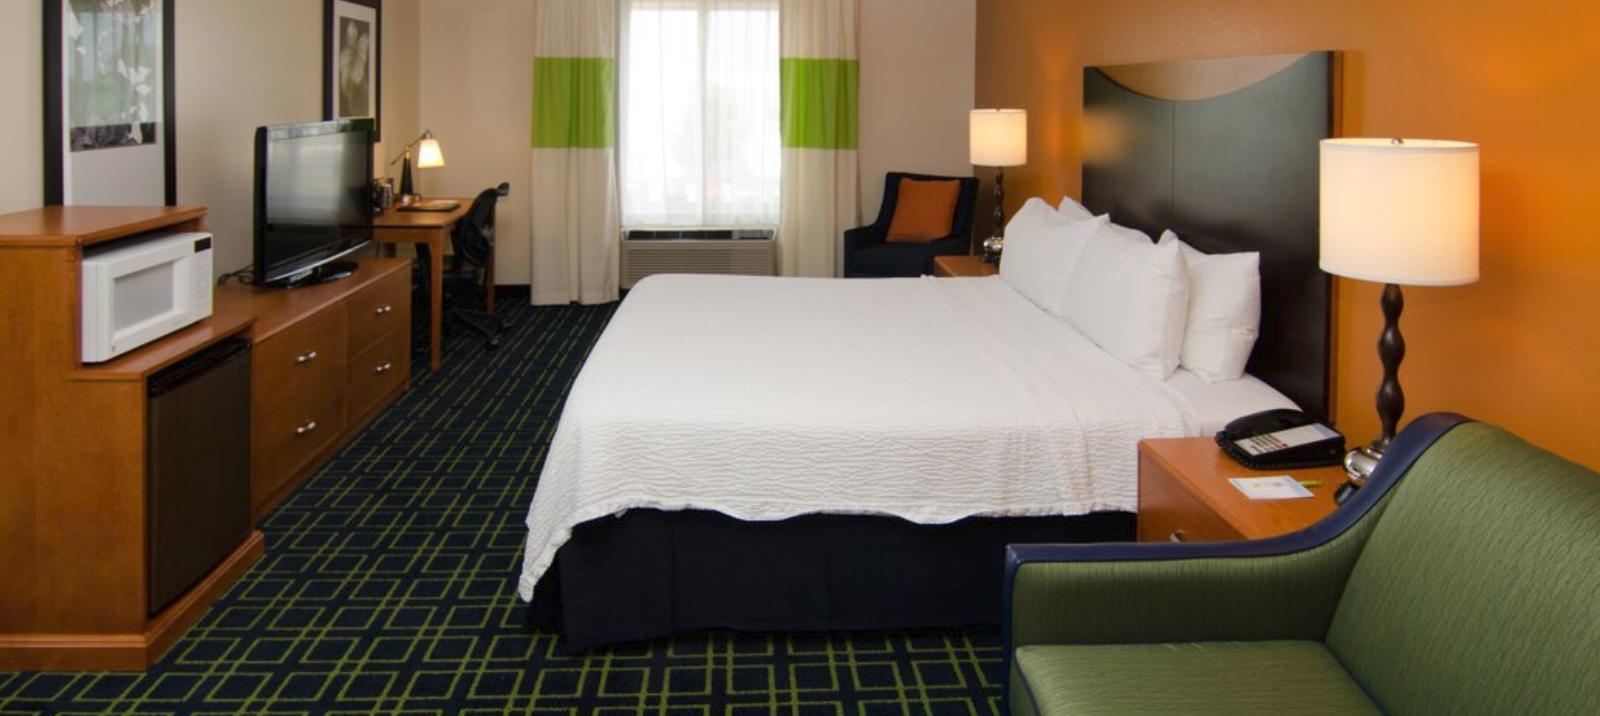 https://www.hotelsbyday.com/_data/default-hotel_image/4/20560/screenshot-2020-08-14-at-12-50-50-pm.png